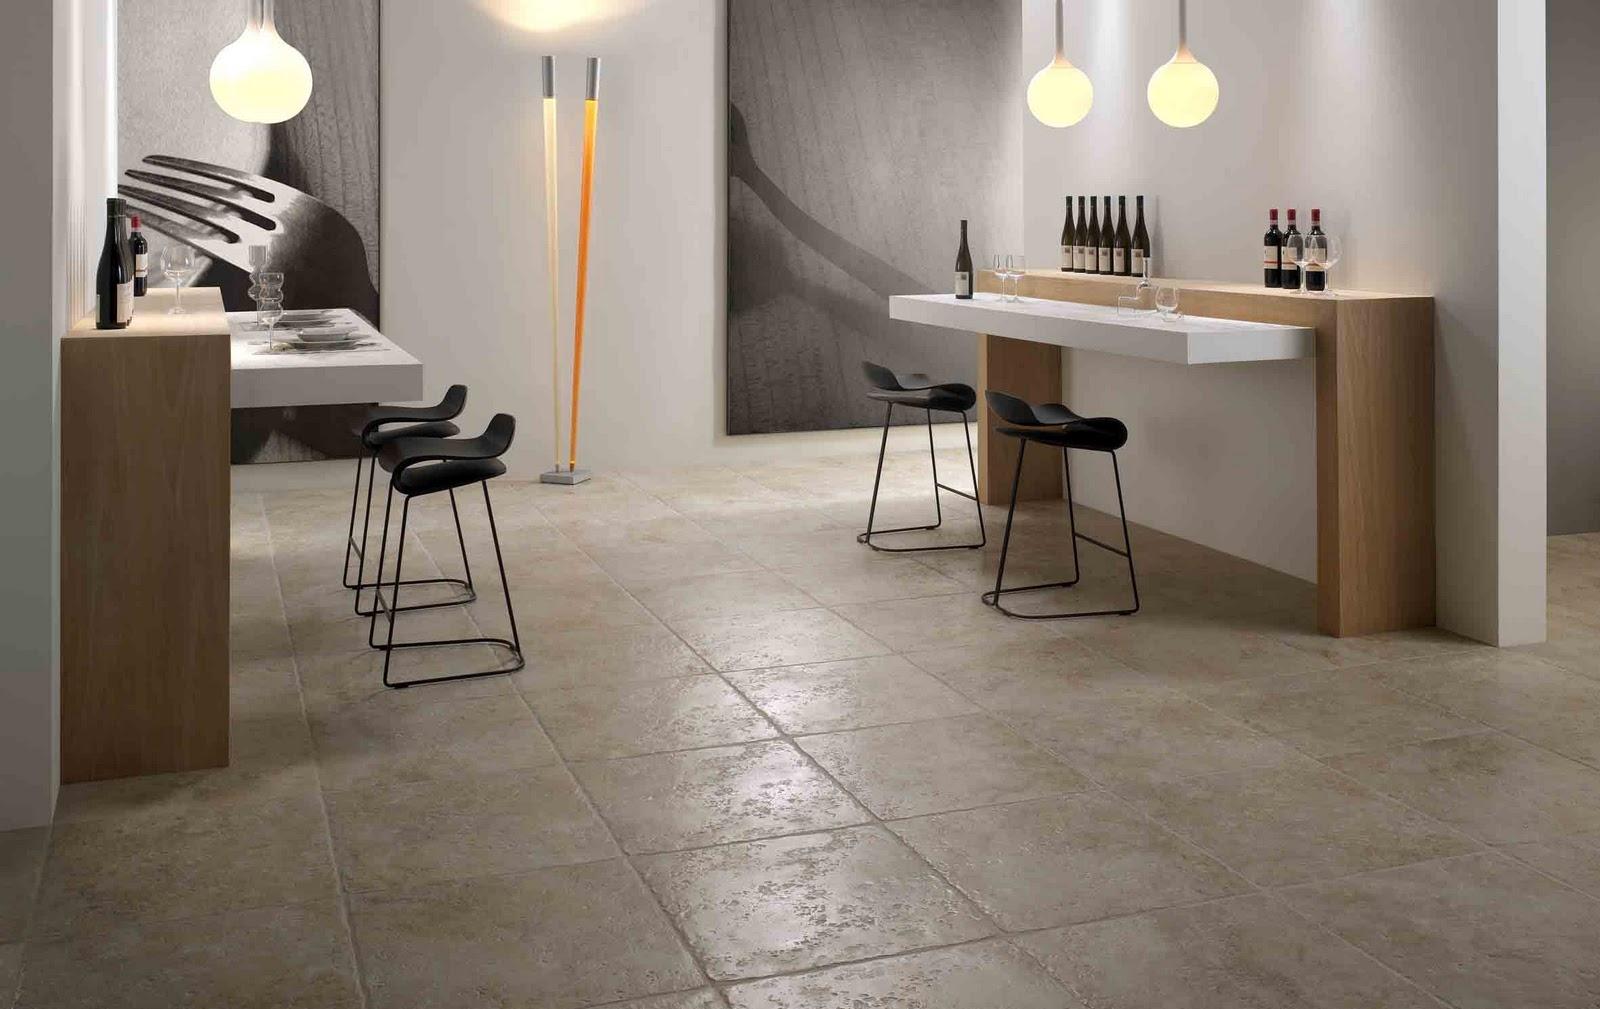 Interesting ambienti interni moderni pavimenti moderni for Pavimenti interni moderni